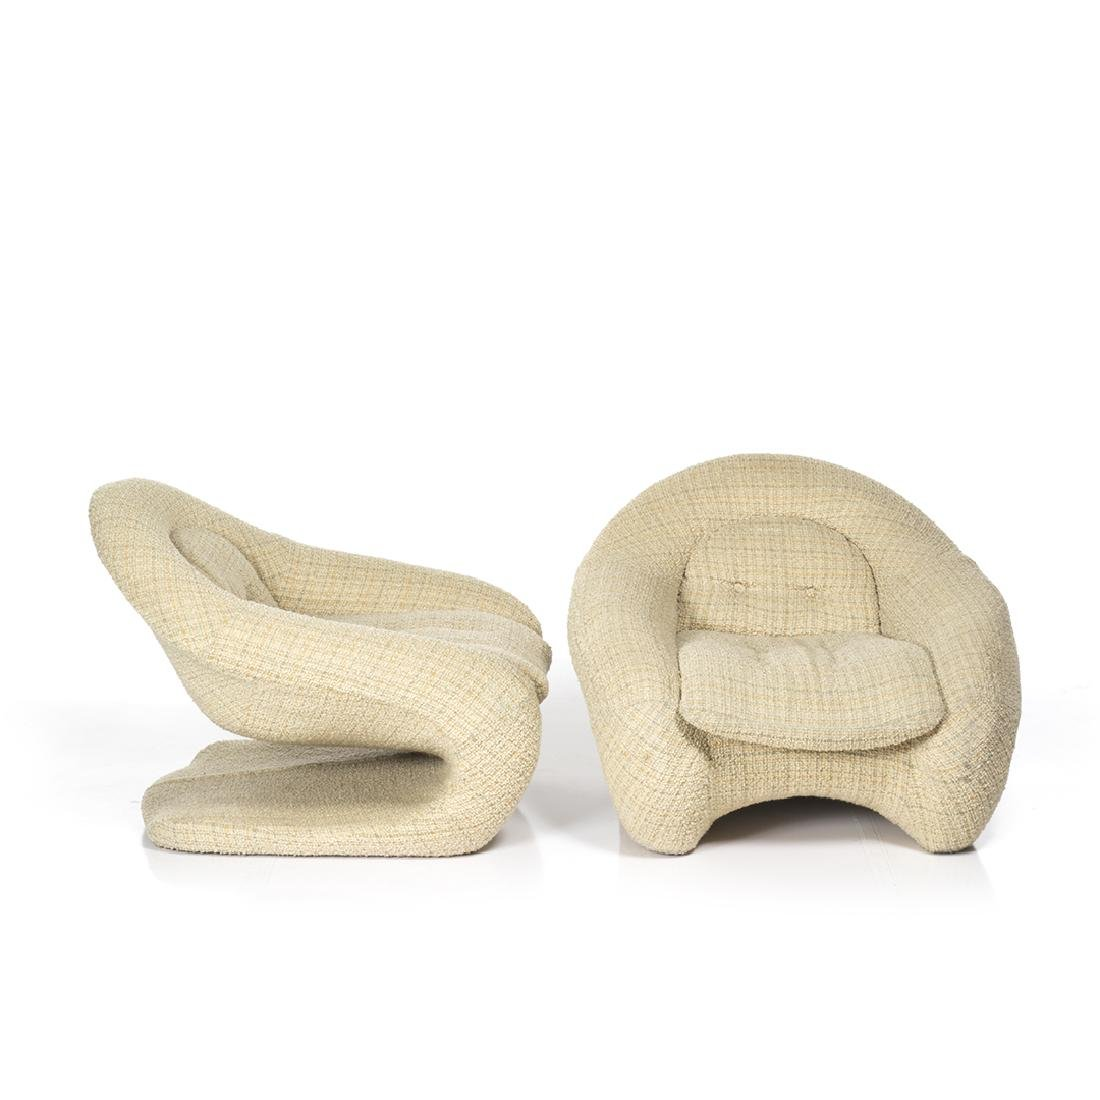 R. Huber Lounge Chairs (2) - 2